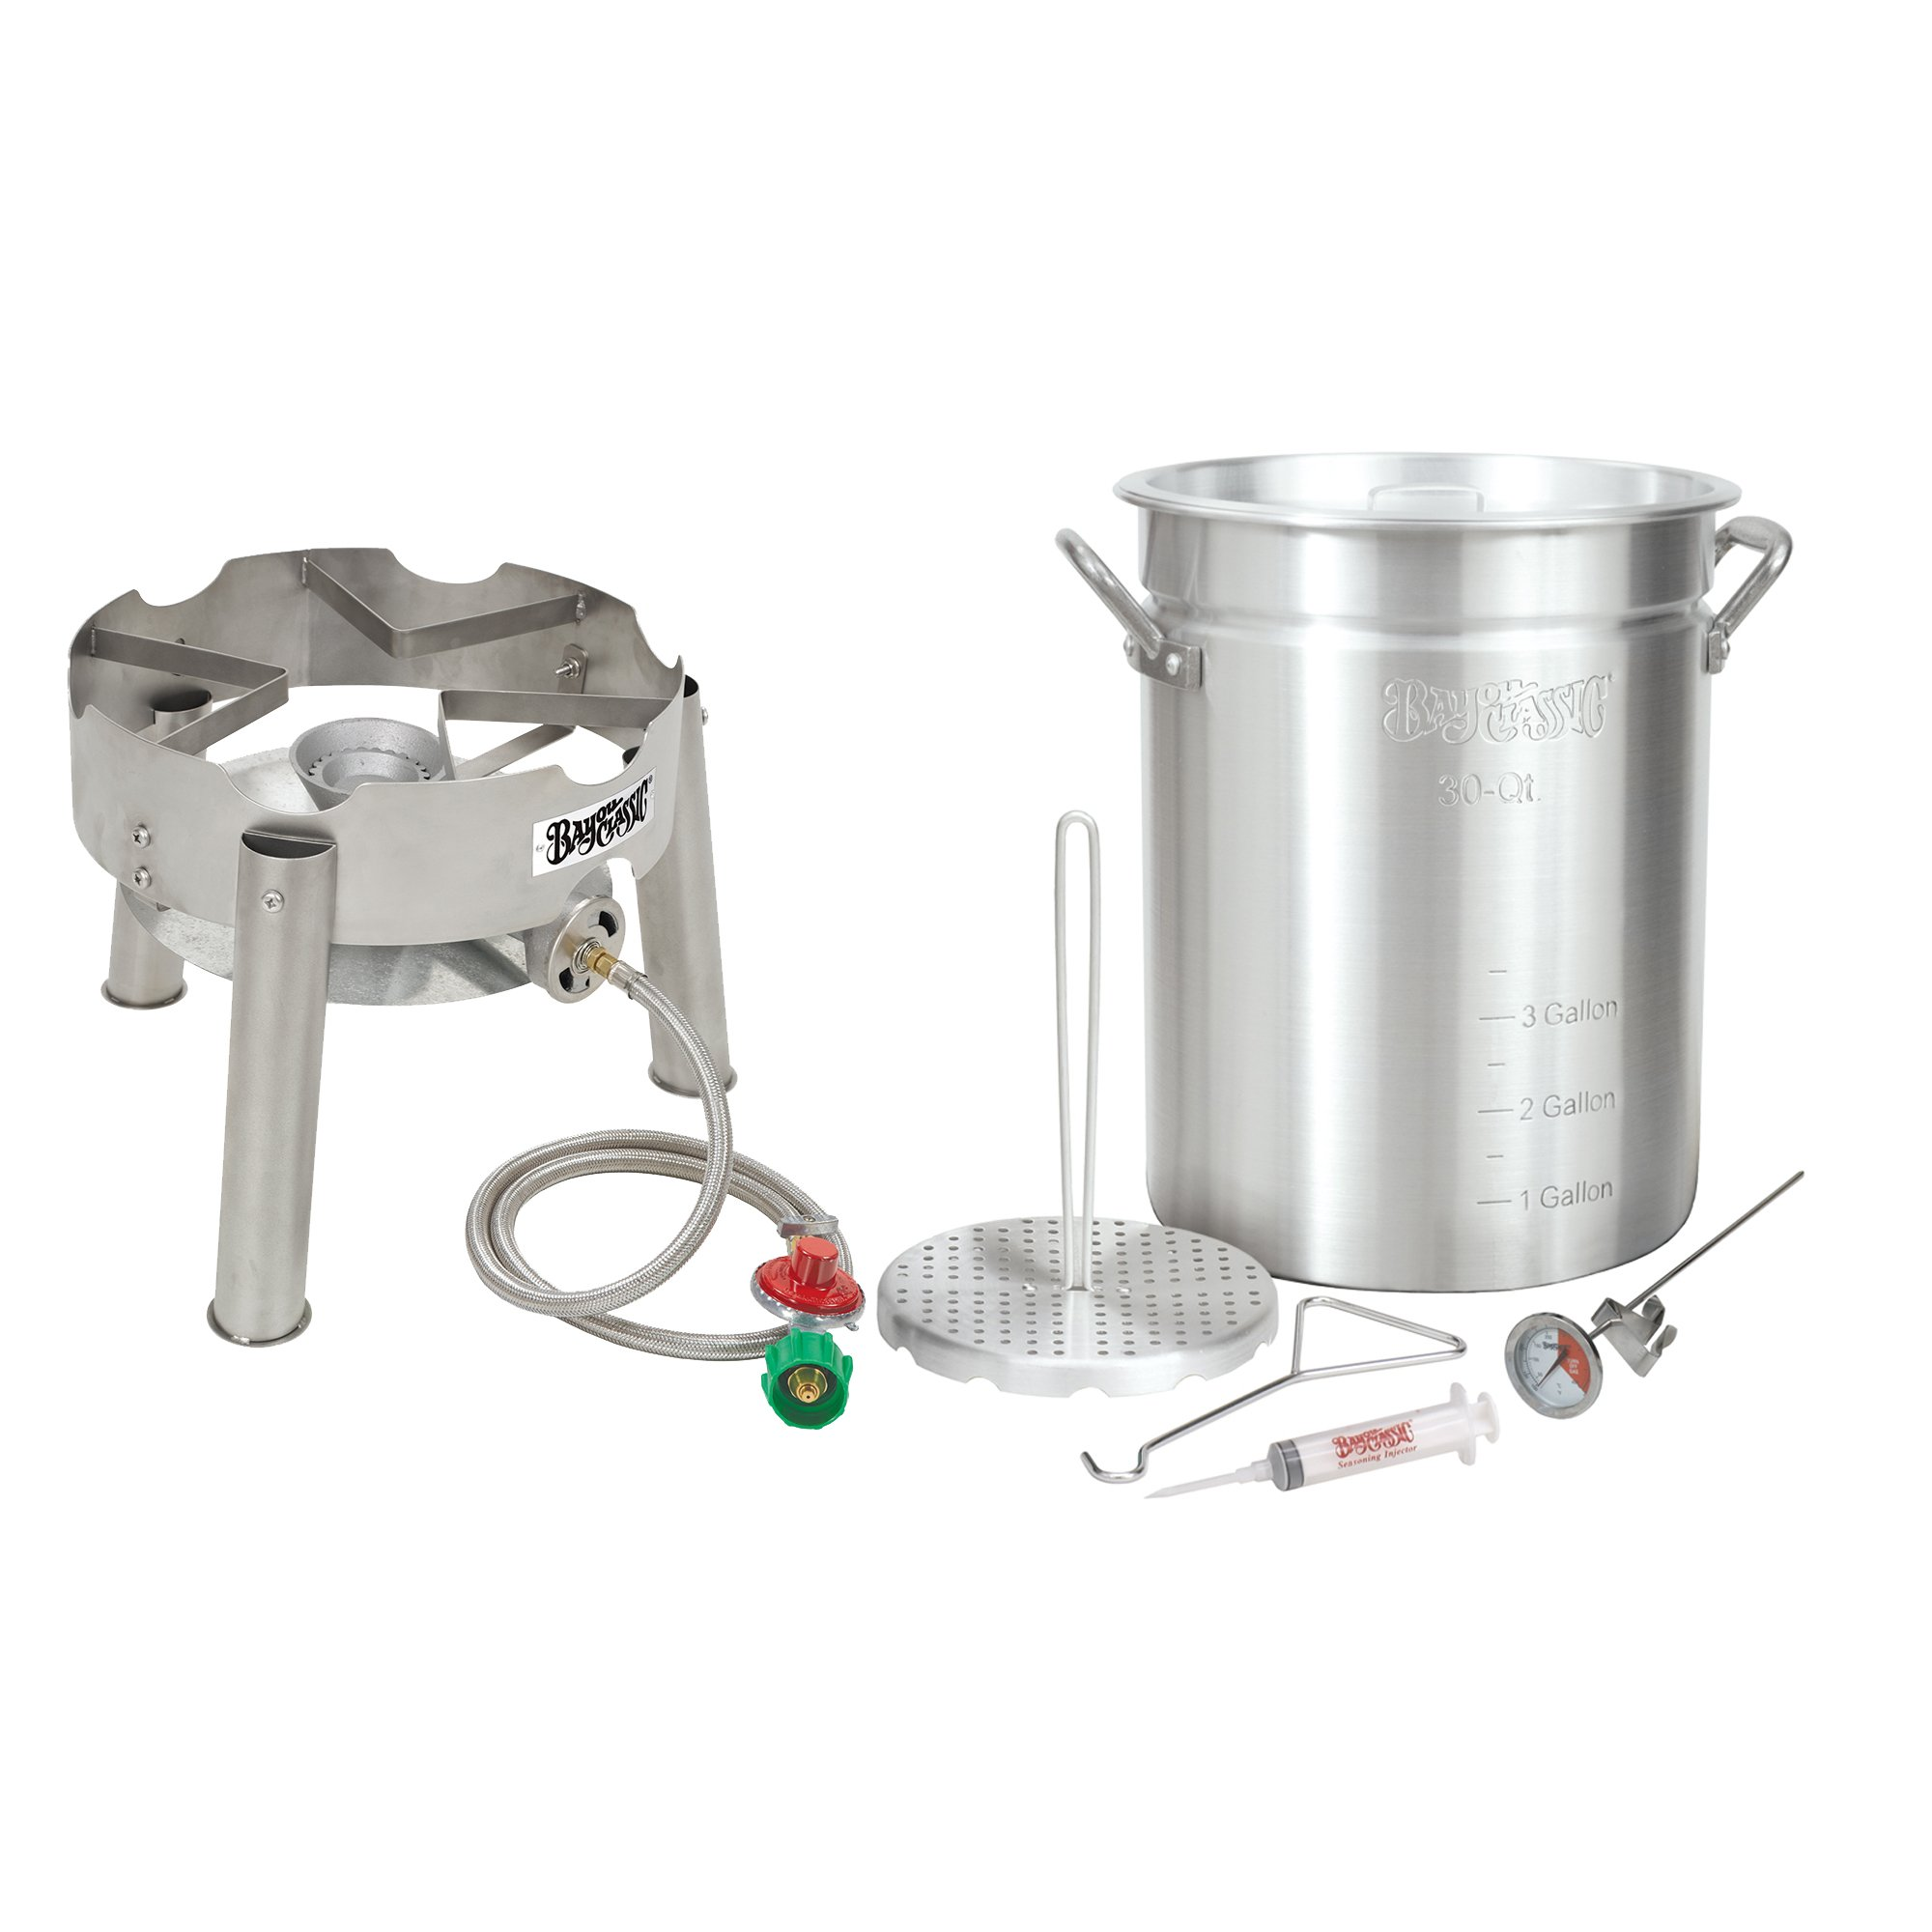 Bayou Classic Complete Deluxe Turkey Fryer Kit Aluminin Pot, Low Profile SS burner.